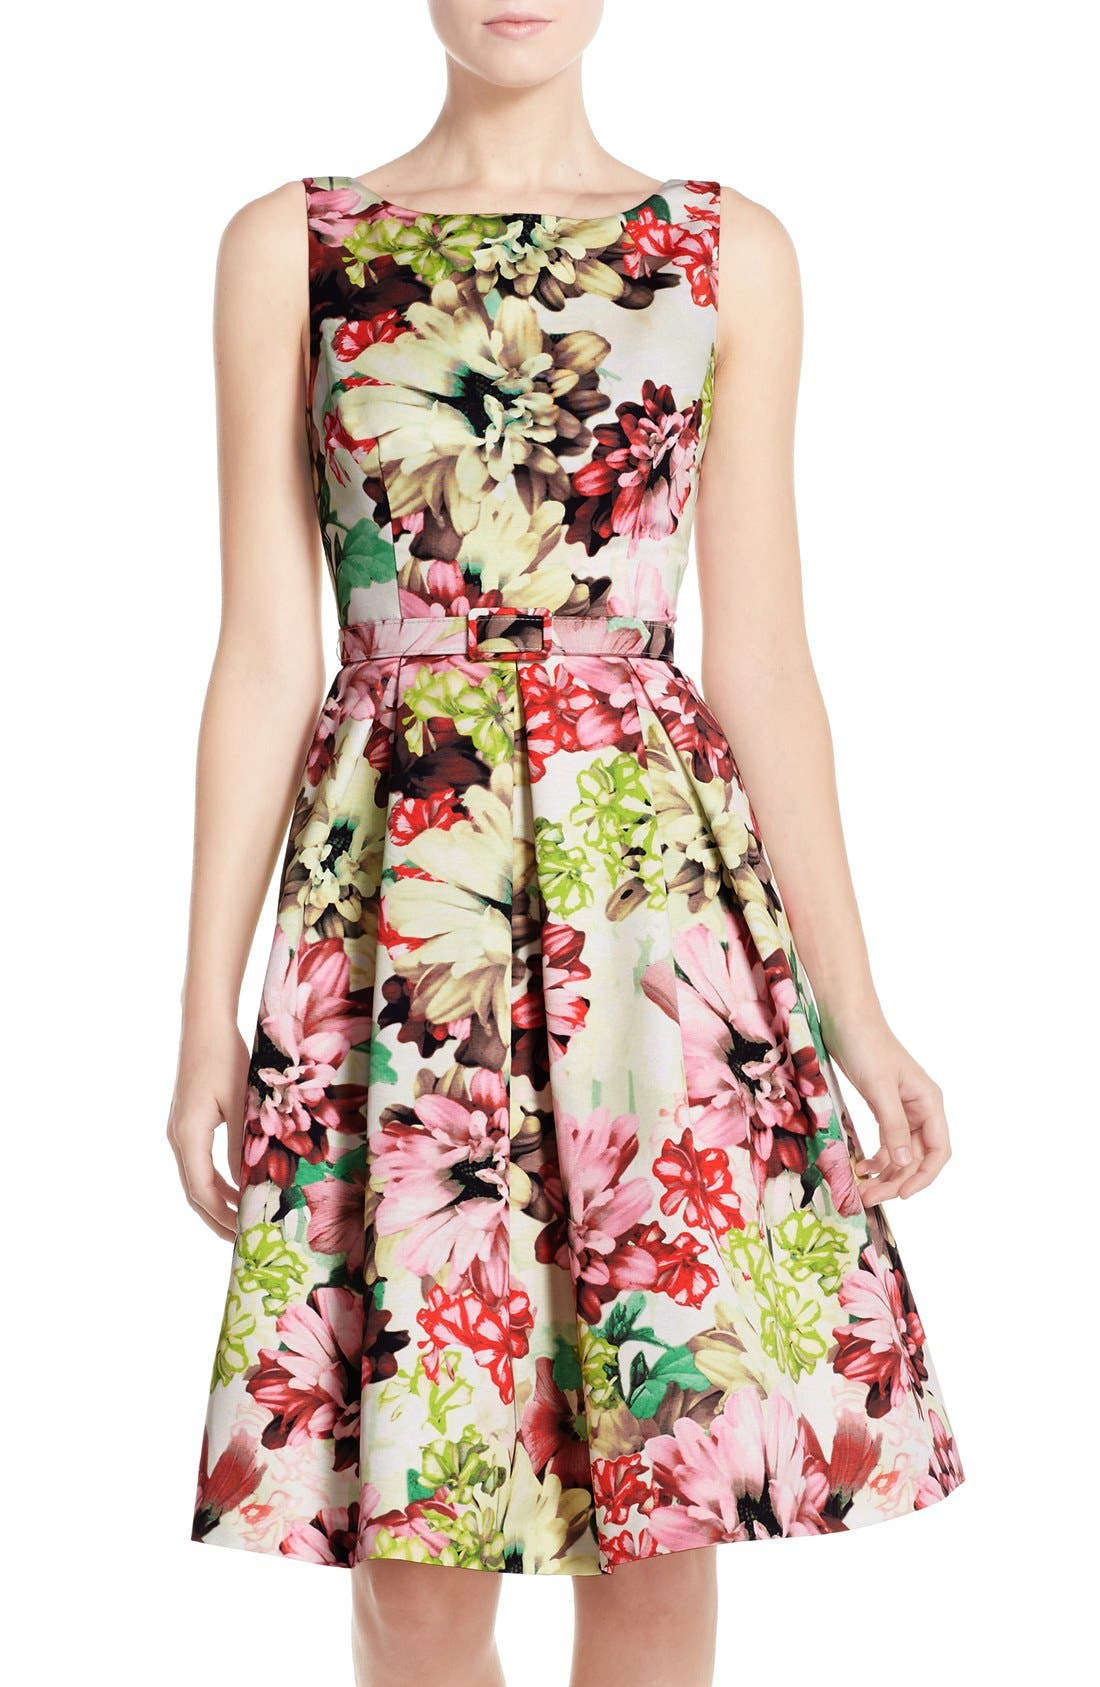 Alternate Image 1 Selected - Eliza J Belted Floral Print Faille Fit & Flare Dress